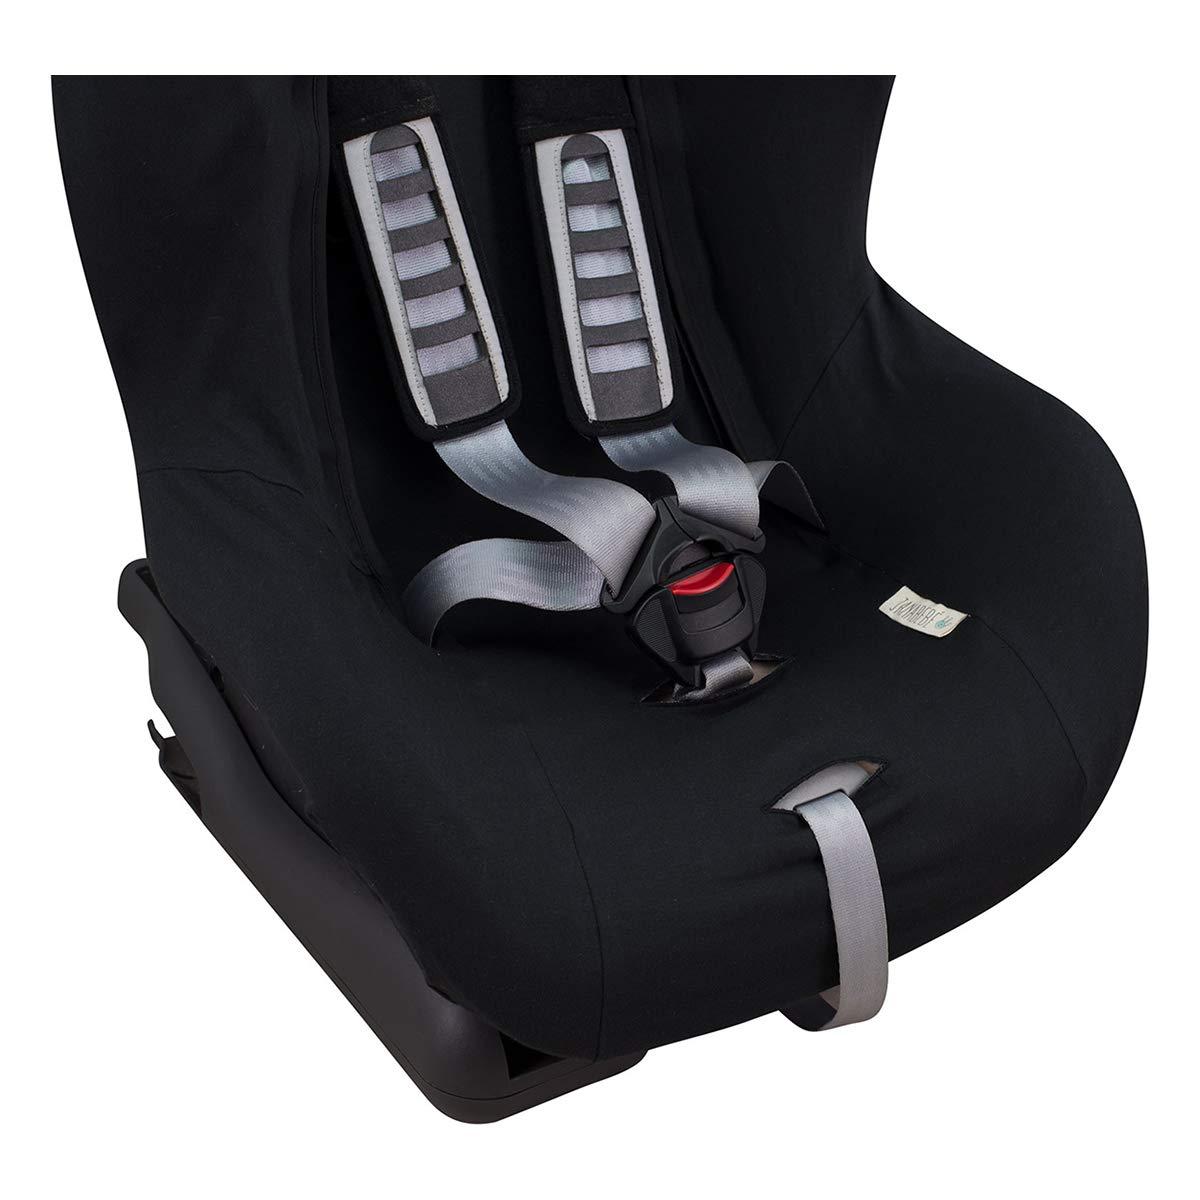 JANABEBE Bezug Universal f/ür Auto-Kindersitz Gr 1 2 3 BLACK STAR